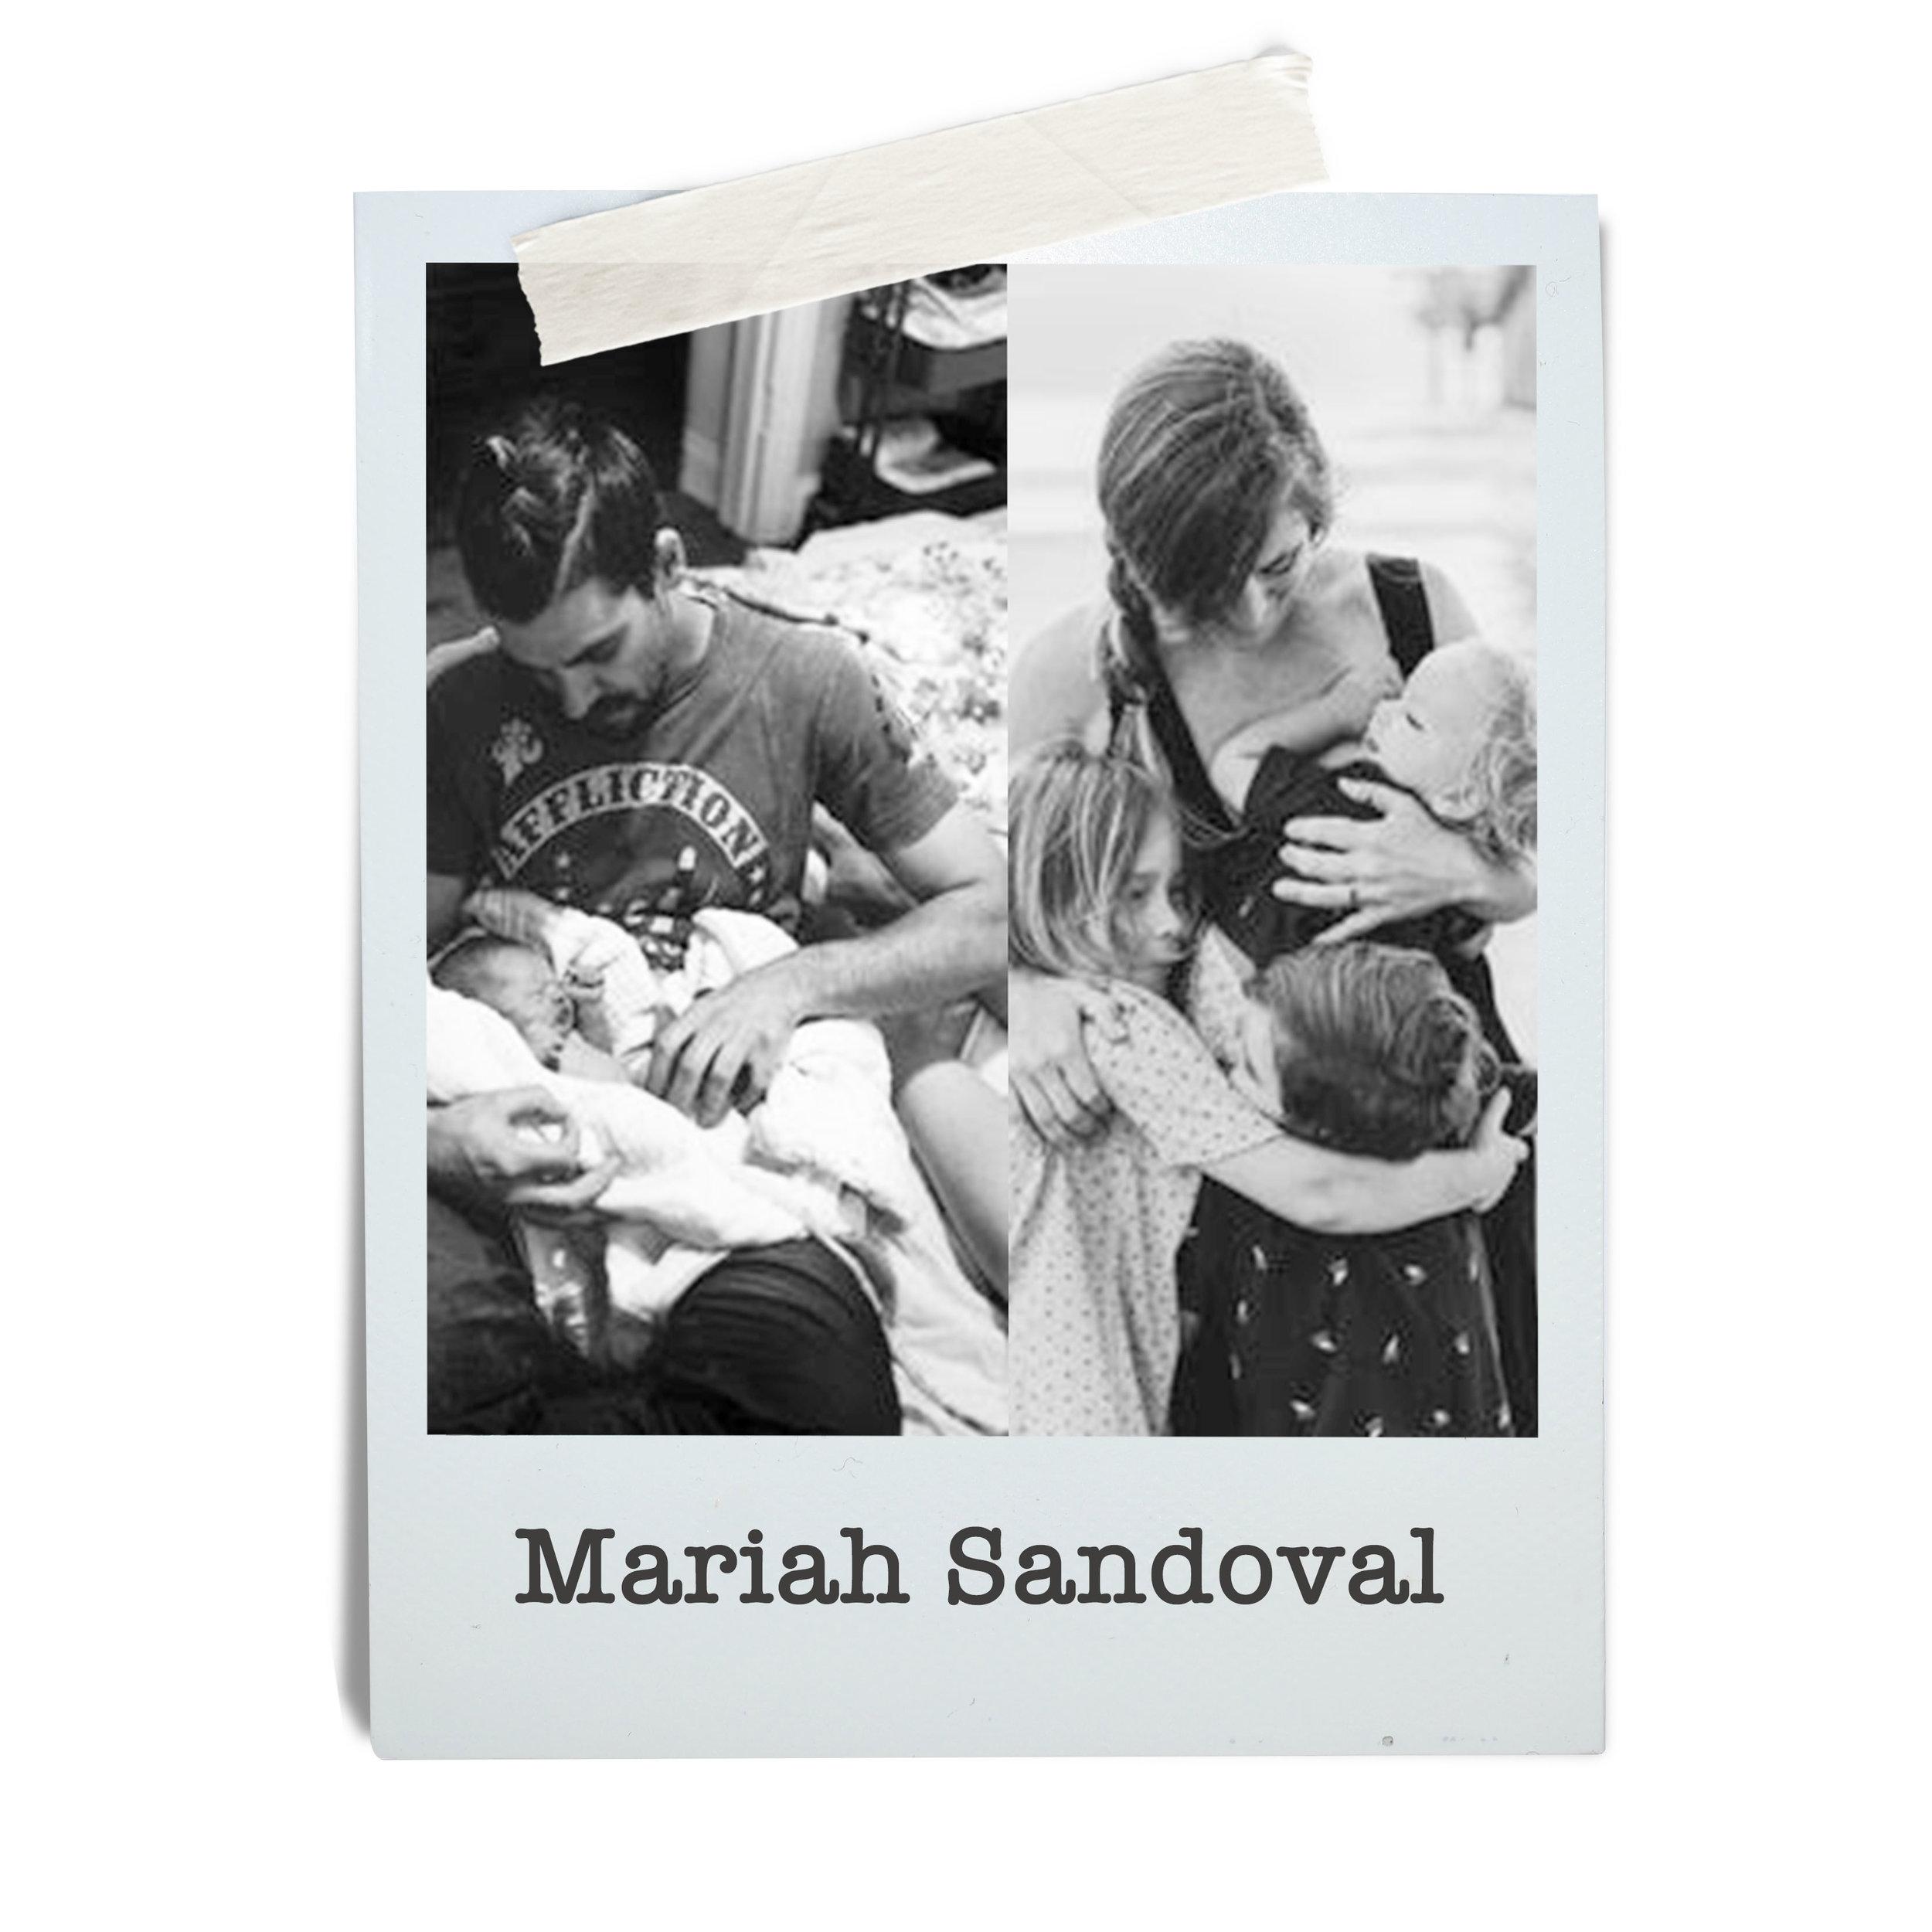 Mariah Sandoval